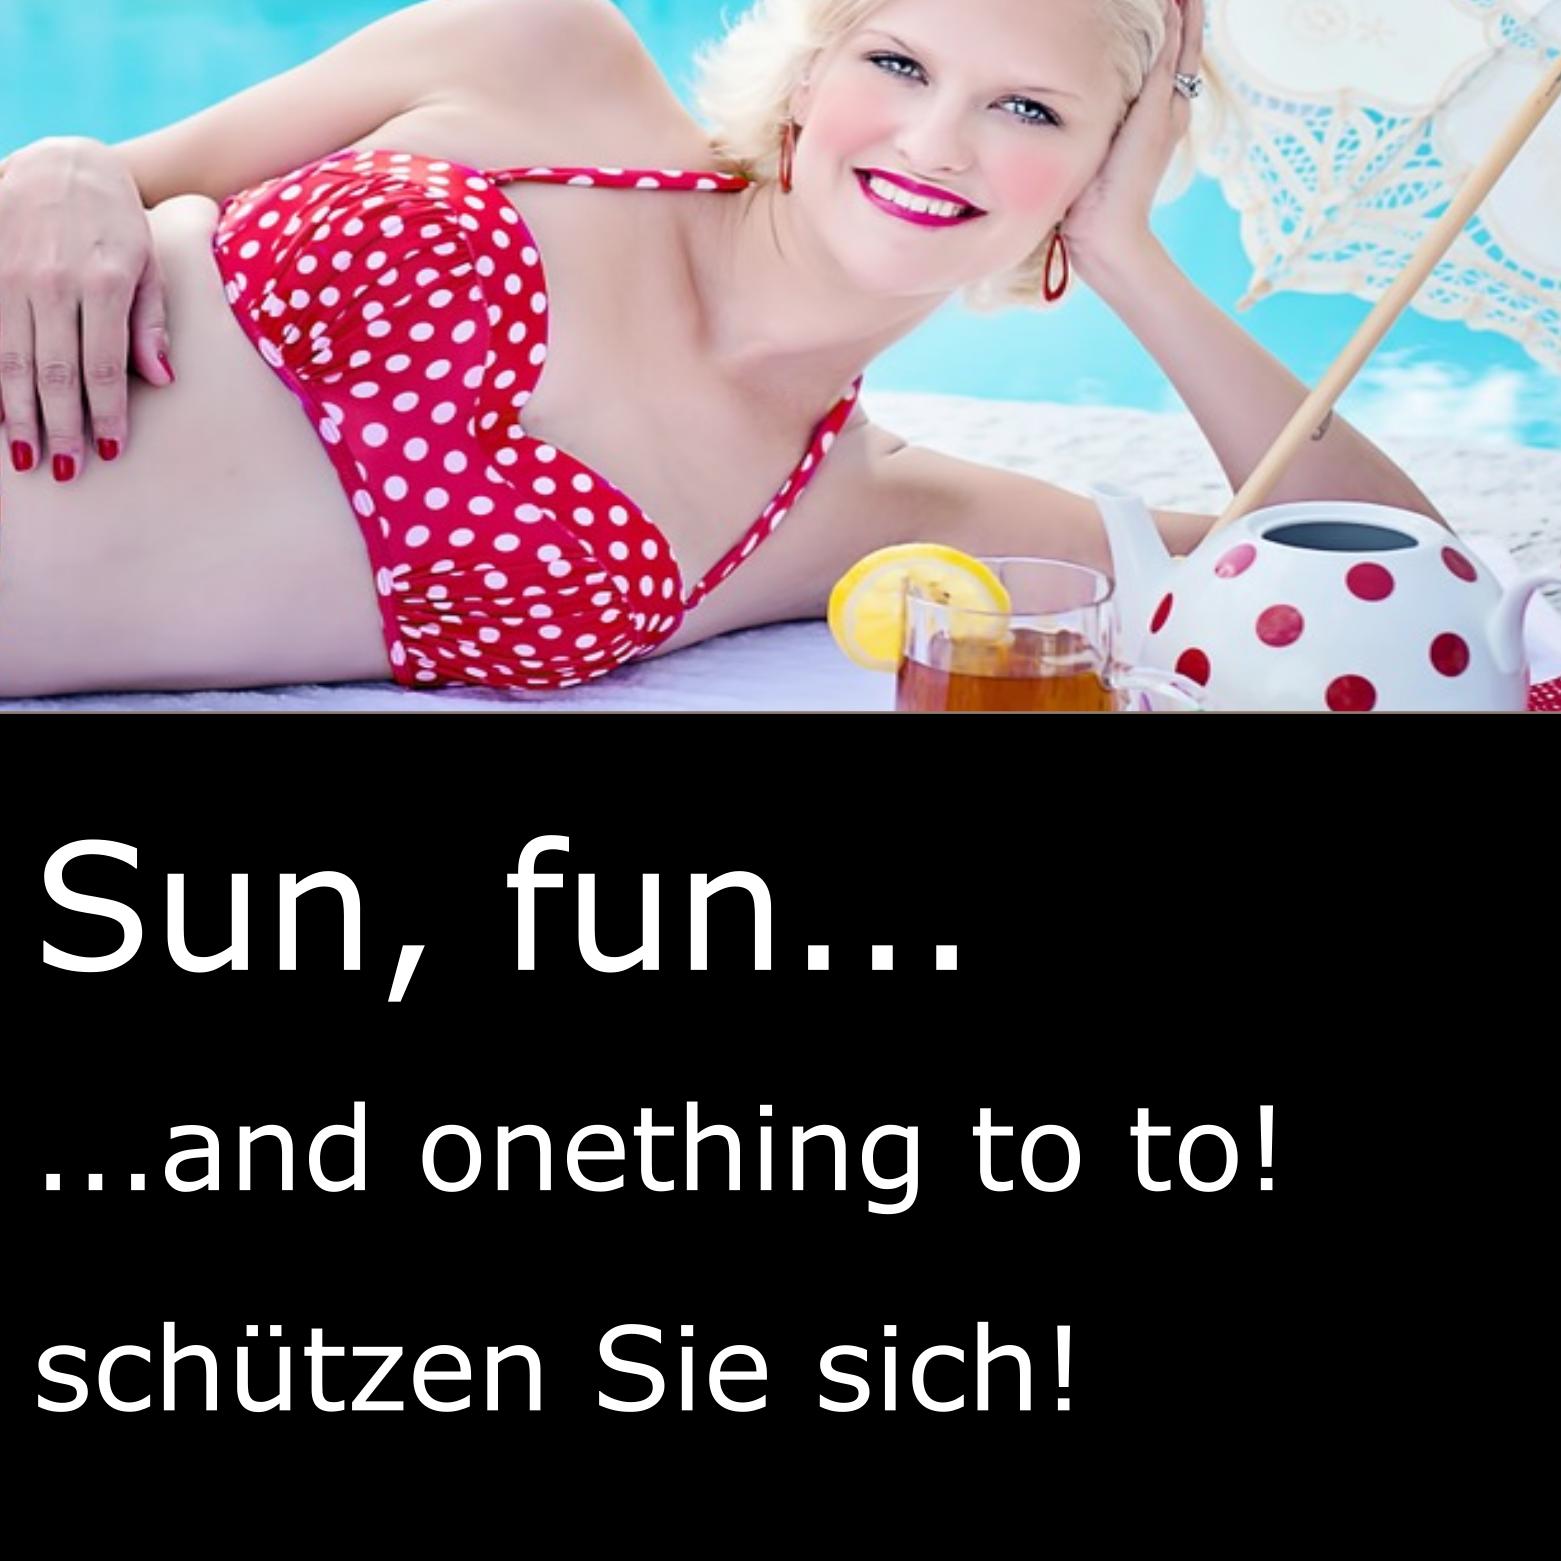 Sun, fun & onething to do!